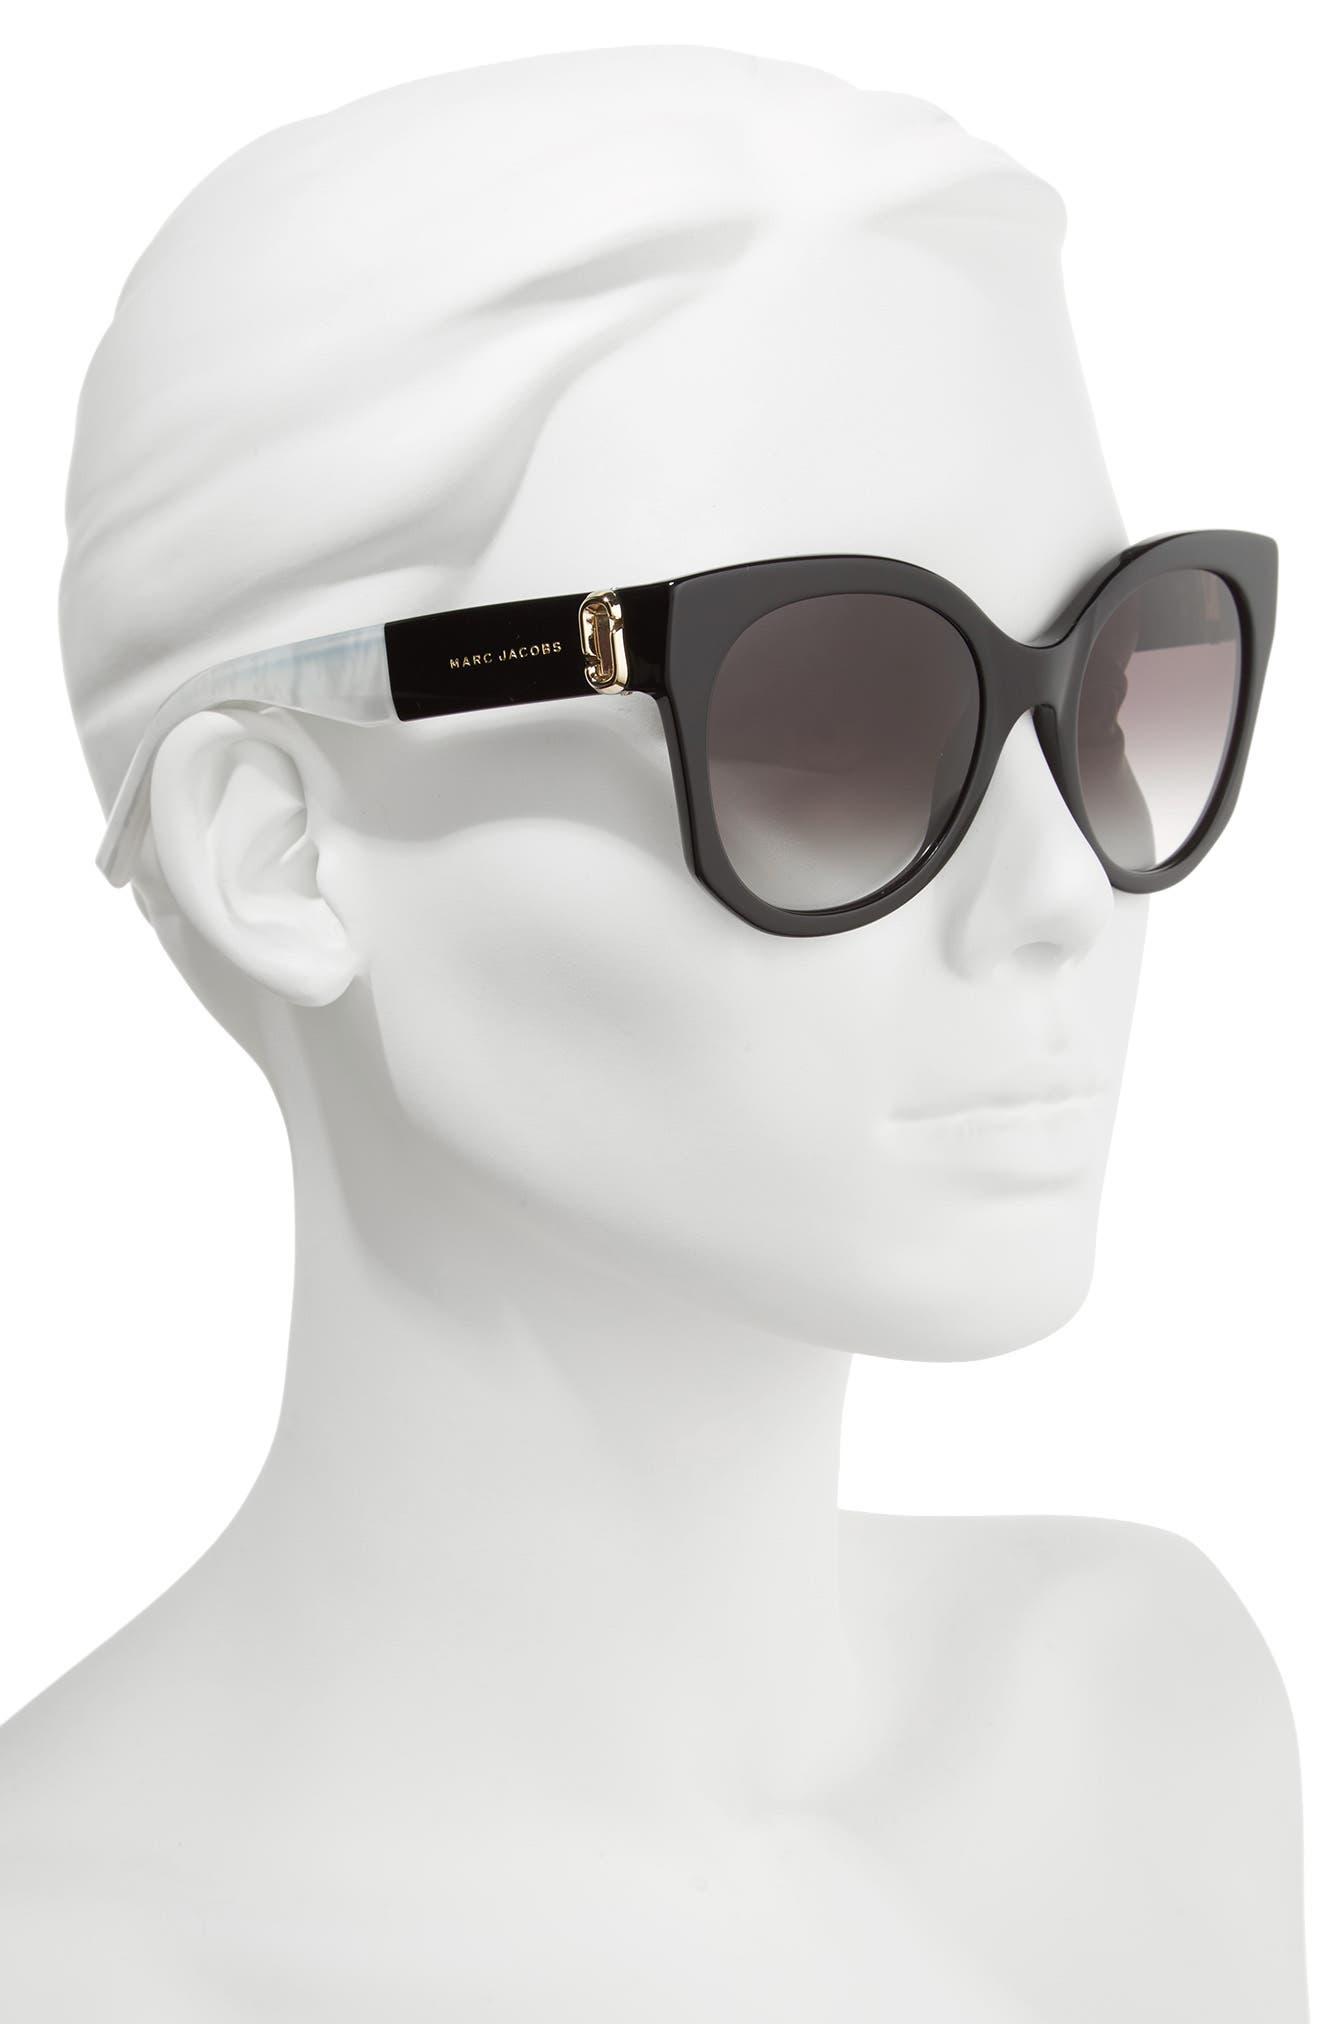 53mm Gradient Lens Cat Eye Sunglasses,                             Alternate thumbnail 2, color,                             001